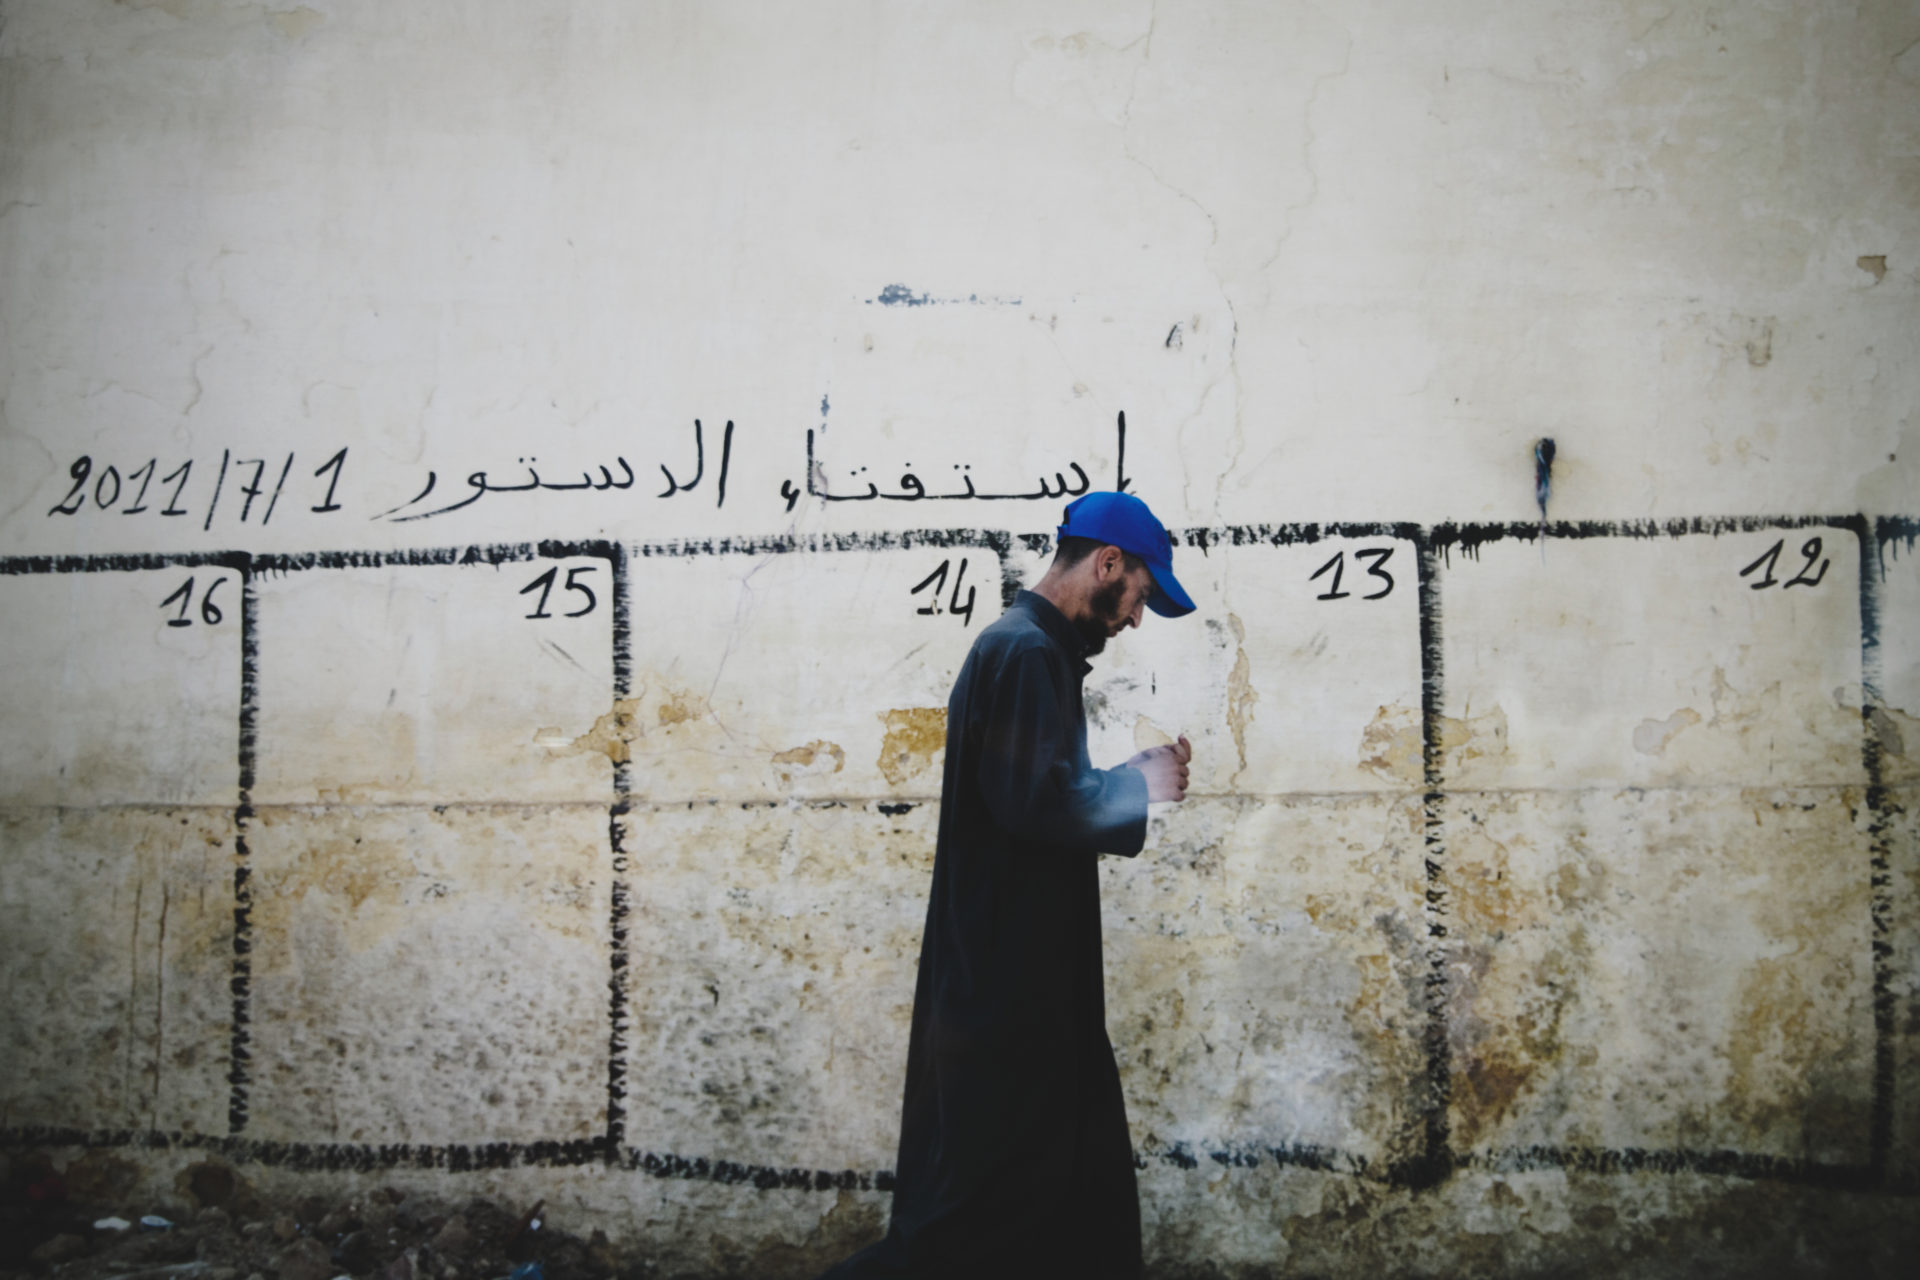 Street-Photography-Morocco_Marokko_IGP0649_Carolin-Weinkopf